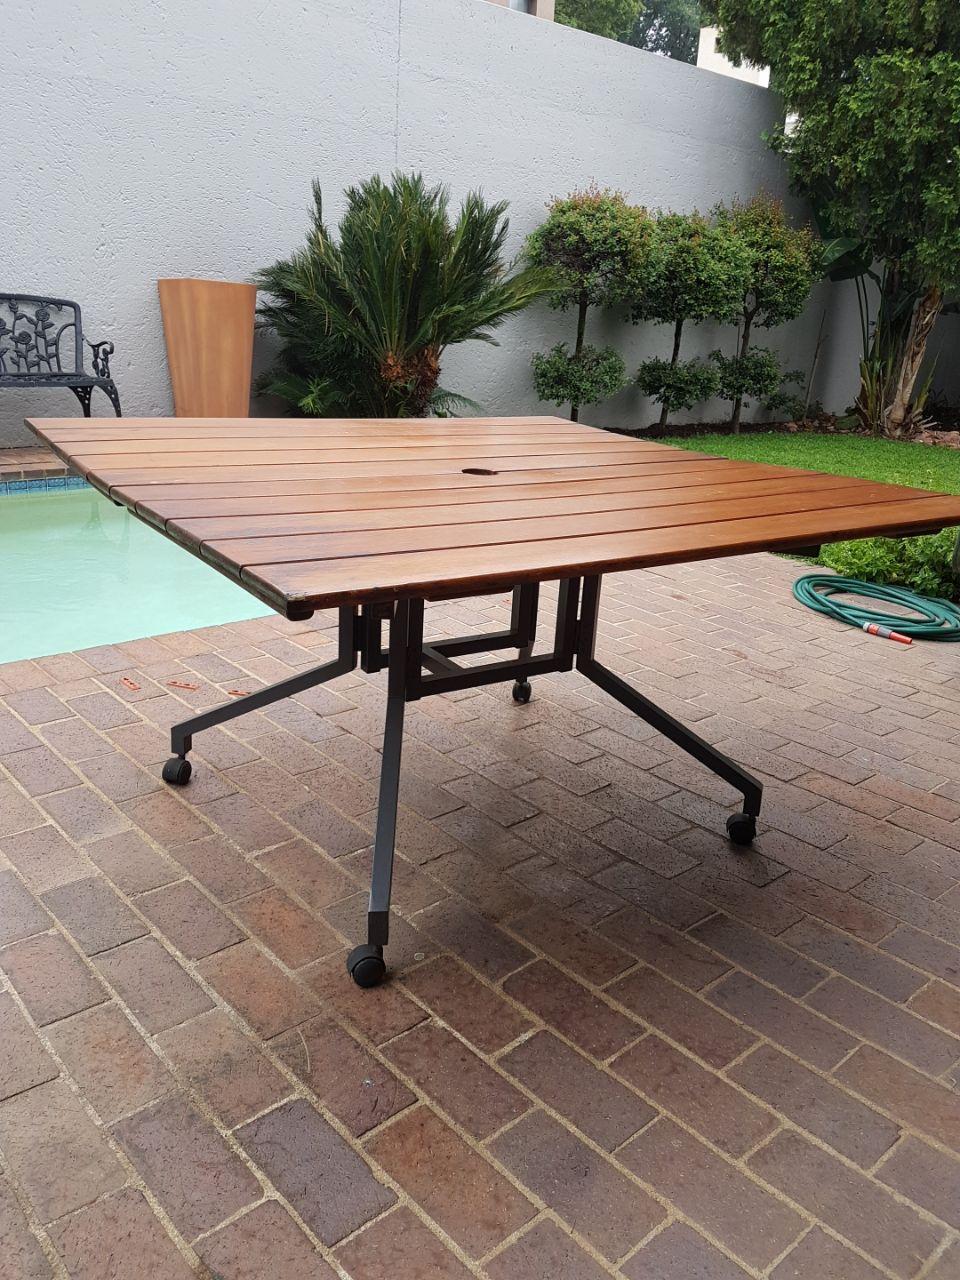 Wooden foldup table, 1.4m x 1.4m, good condition